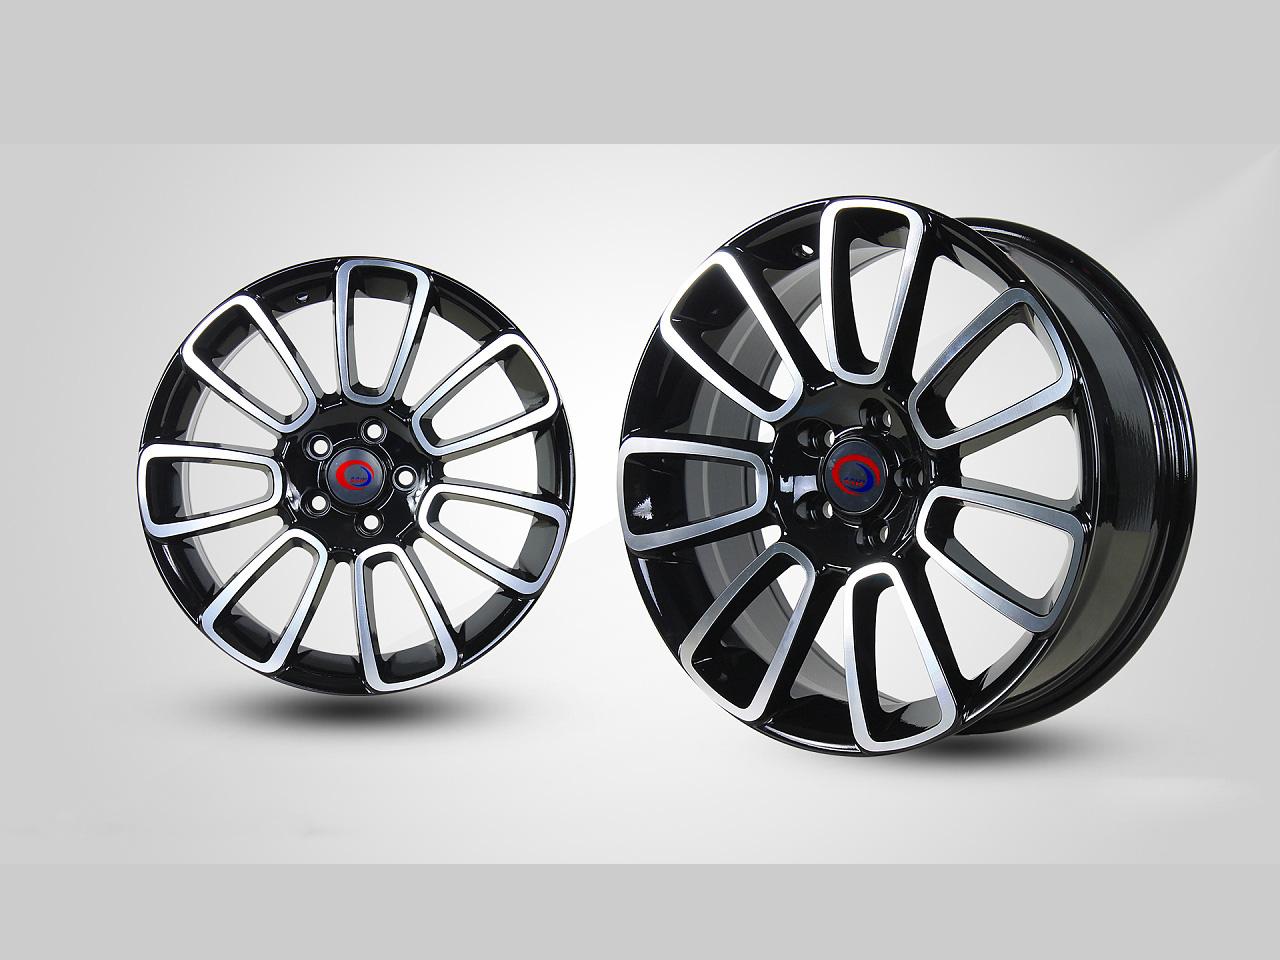 16-28 inches wheels aluminum alloy wheels a11